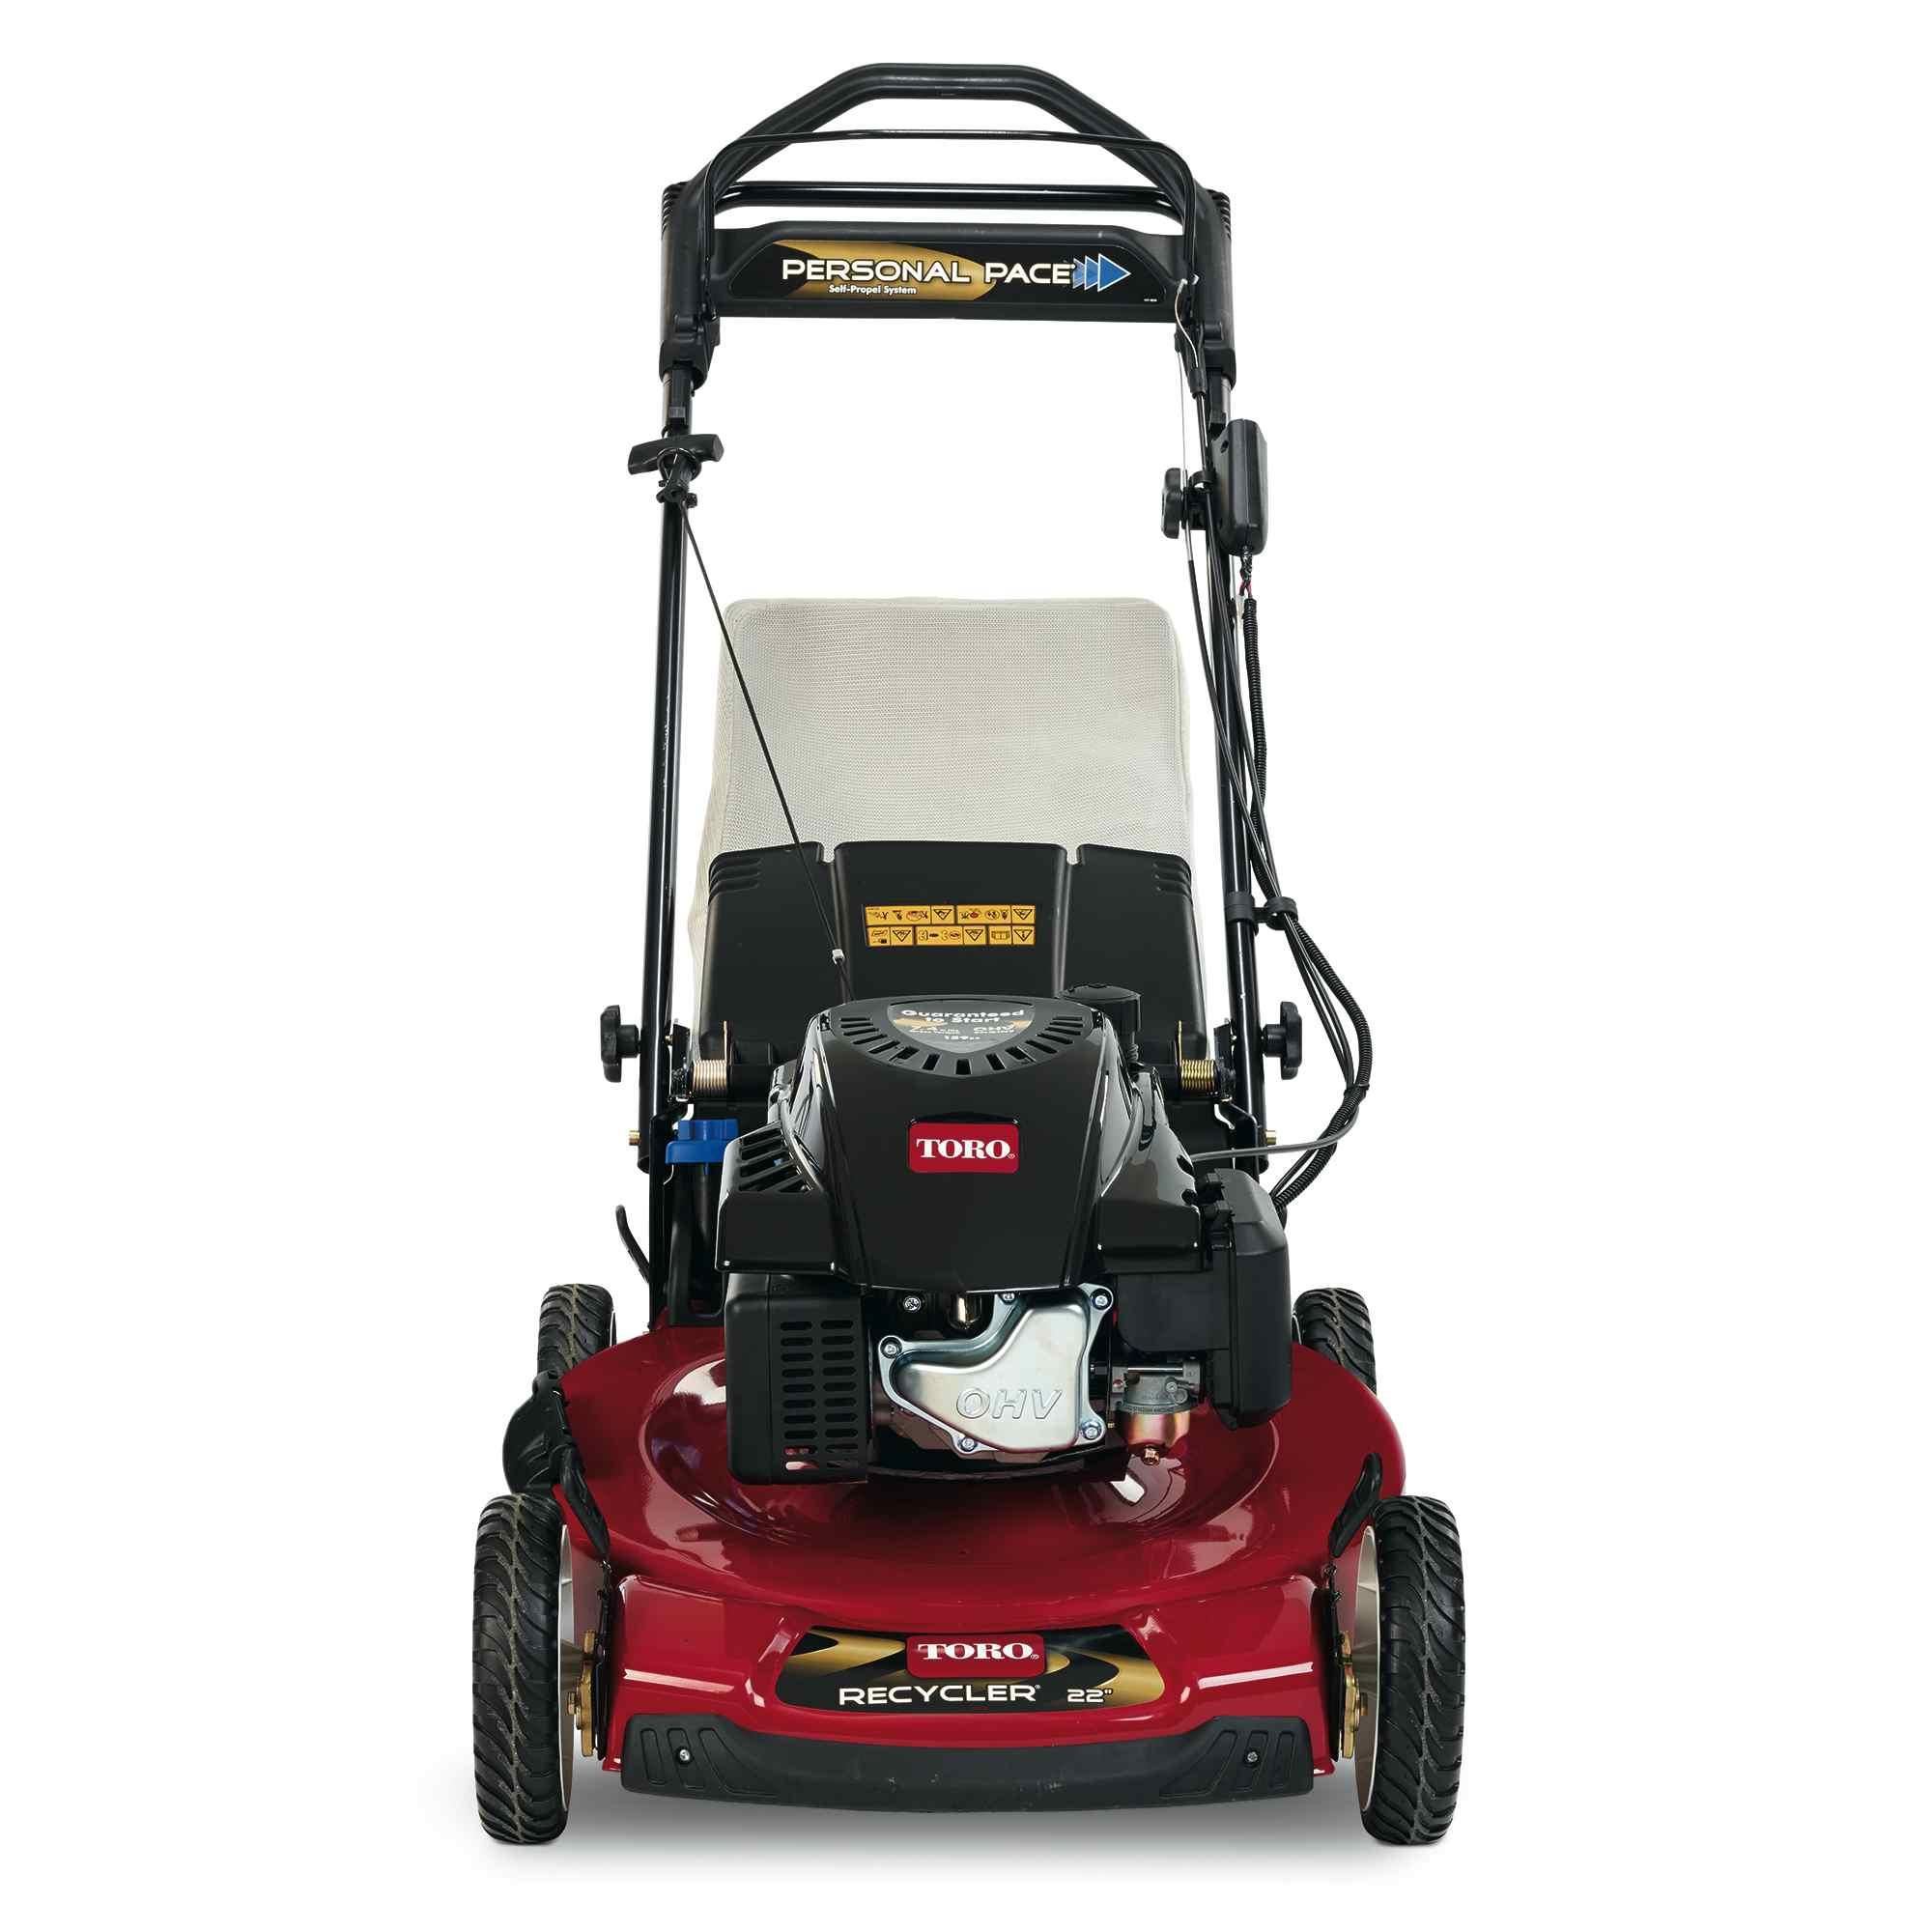 Toro Lawn Mower: Model 20374/SERIAL: 313000001-313999999